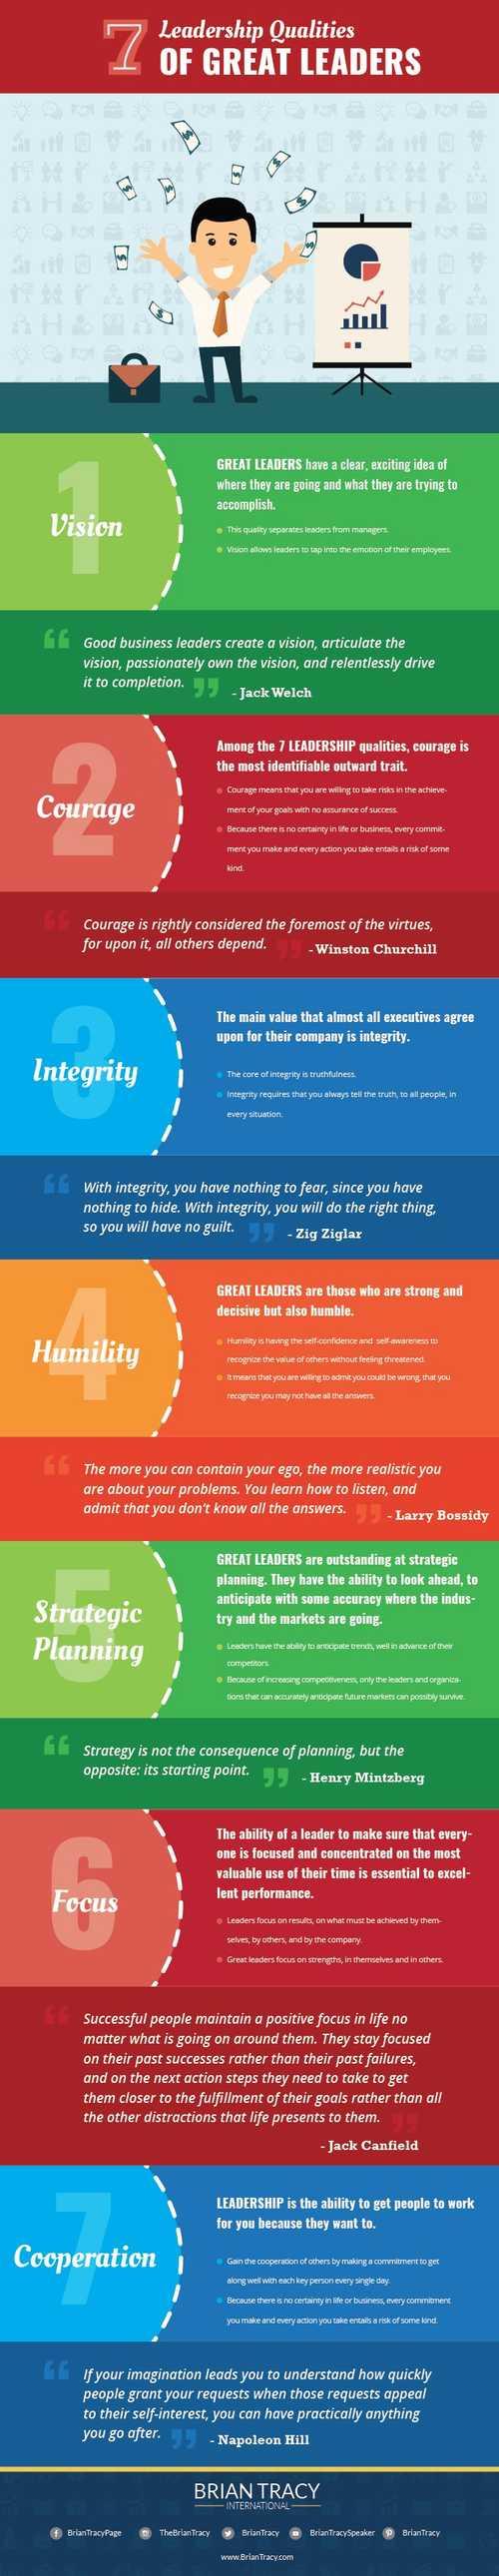 7 Leadership Qualities & Characteristics of Good Leaders | Brian Tracy